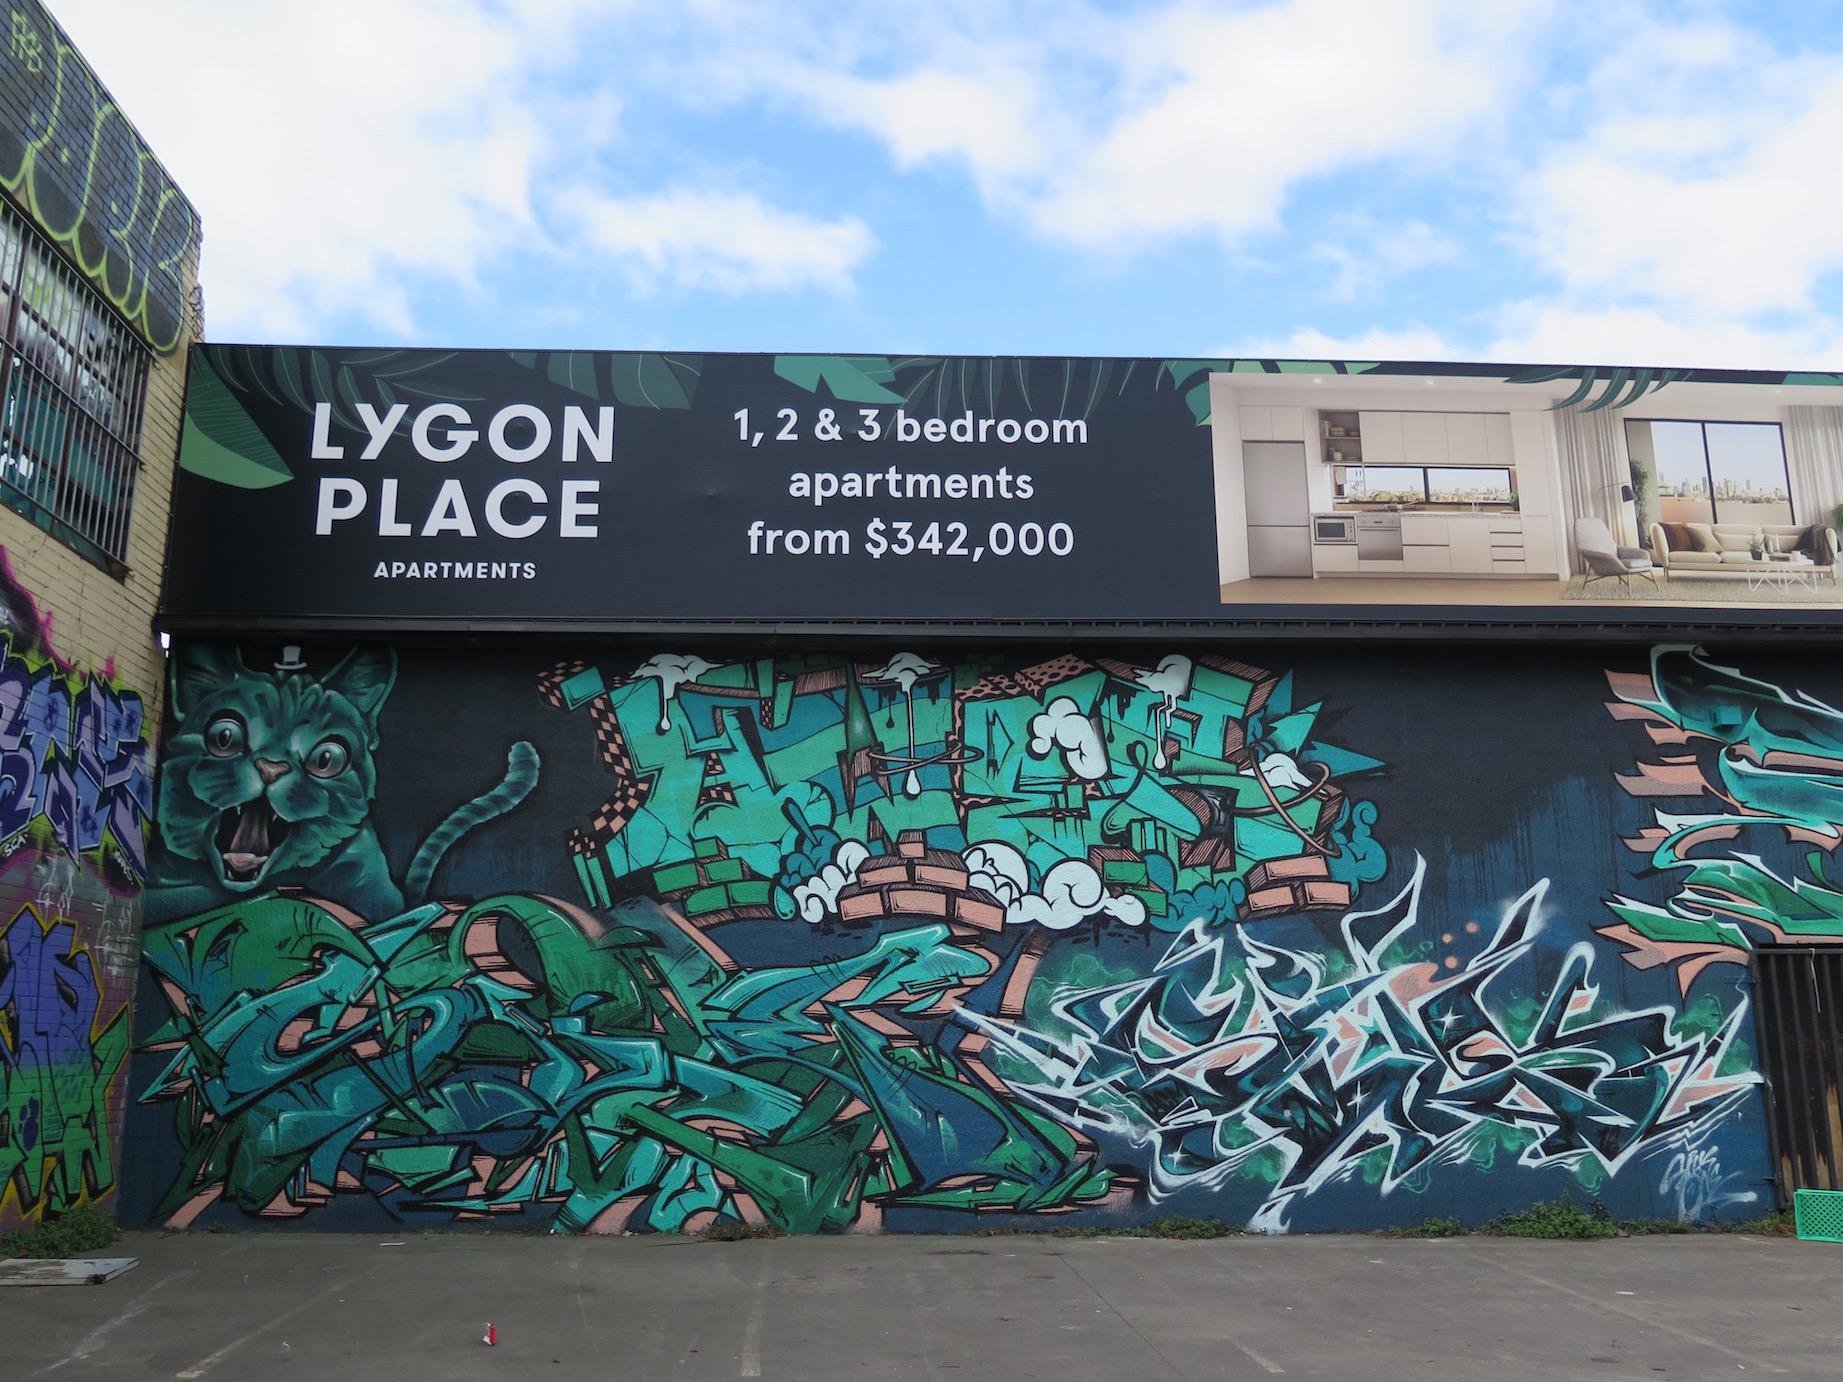 deansunshine_landofsunshine_melbourne_streetart_graffiti_lygon place graff takeover 1